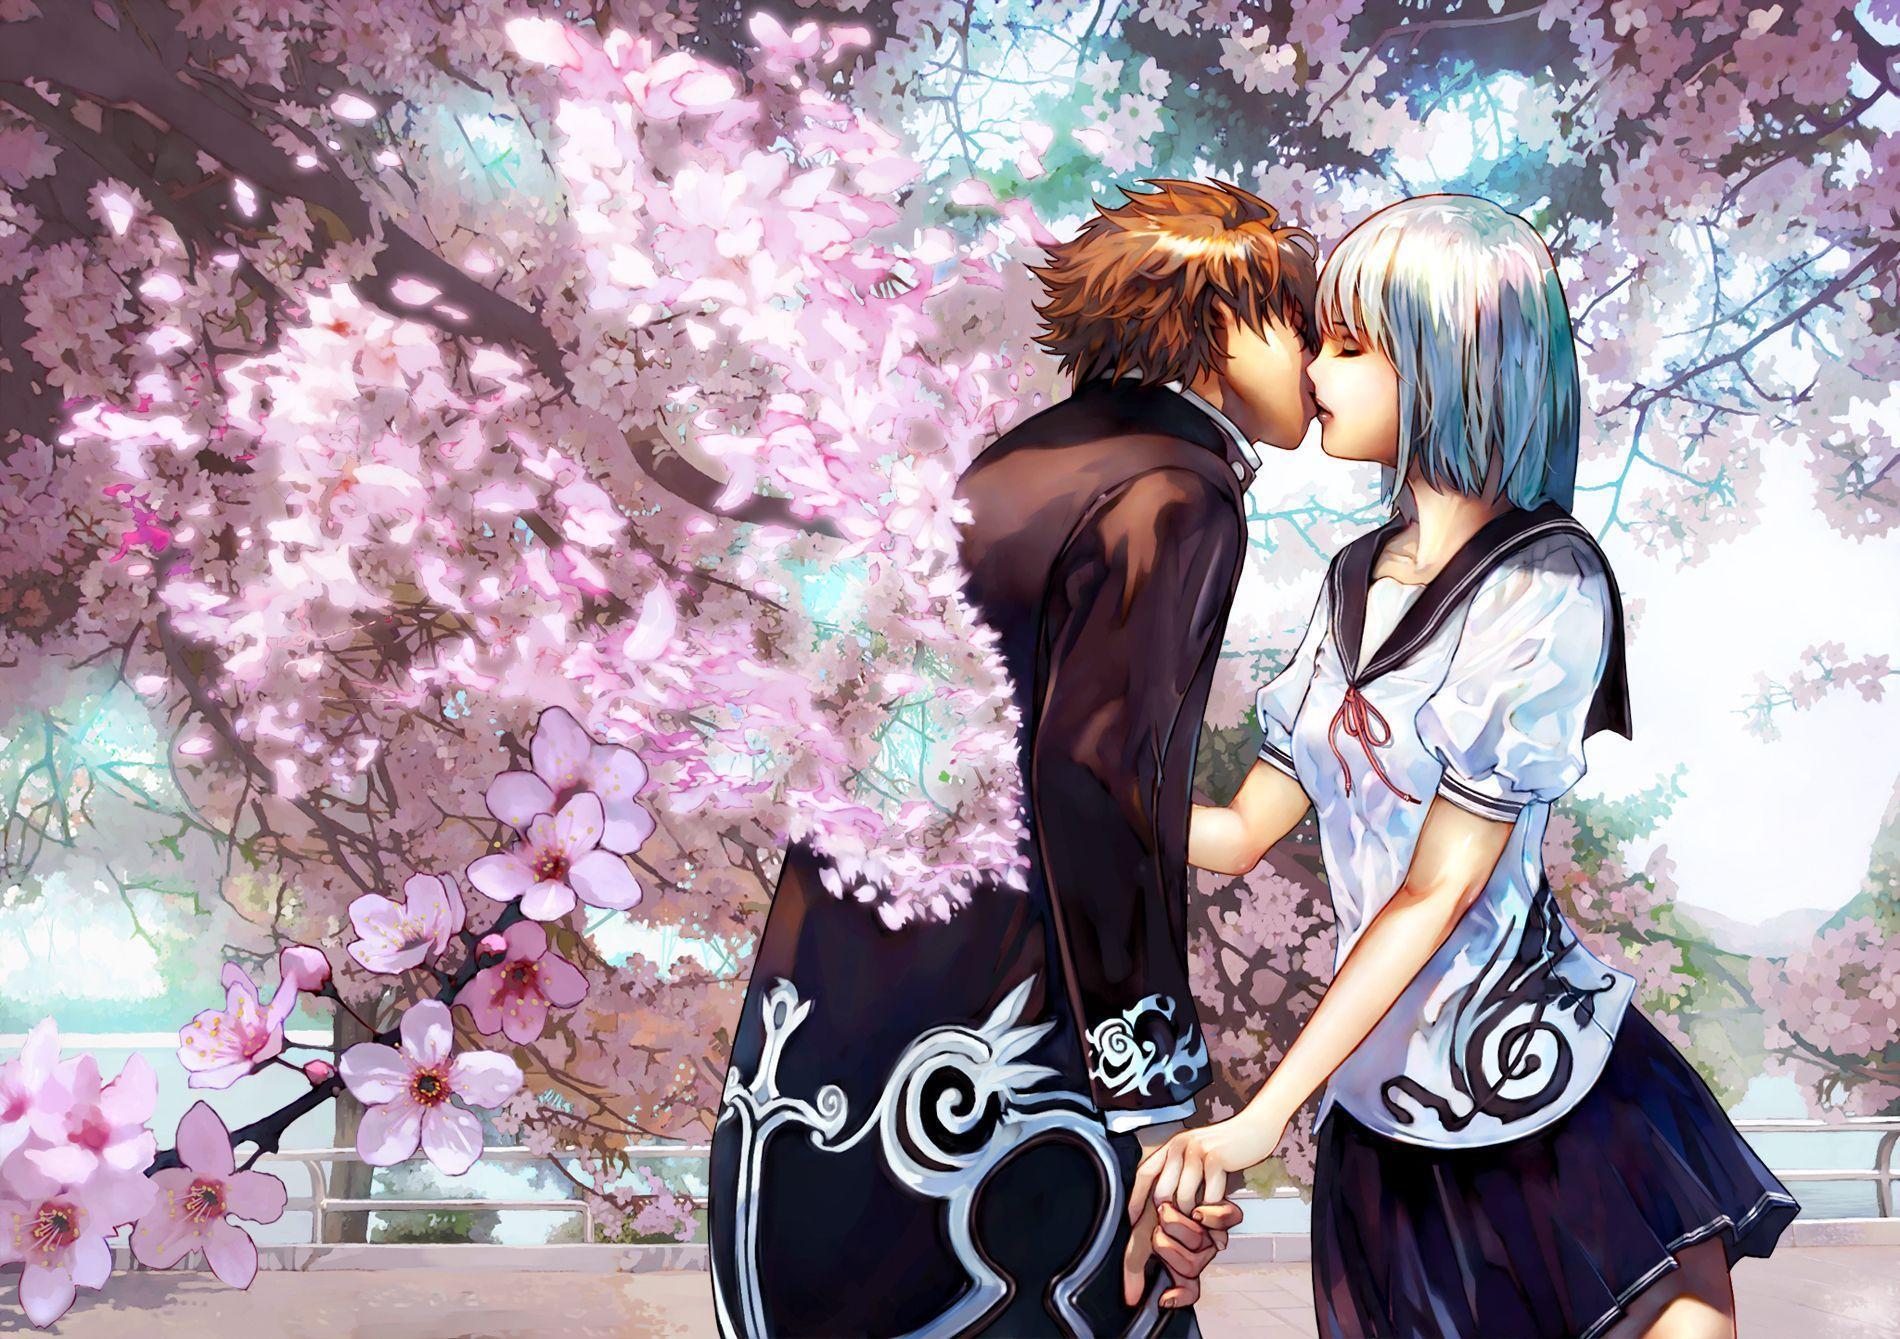 Anime Love Desktop Wallpapers Top Free Anime Love Desktop